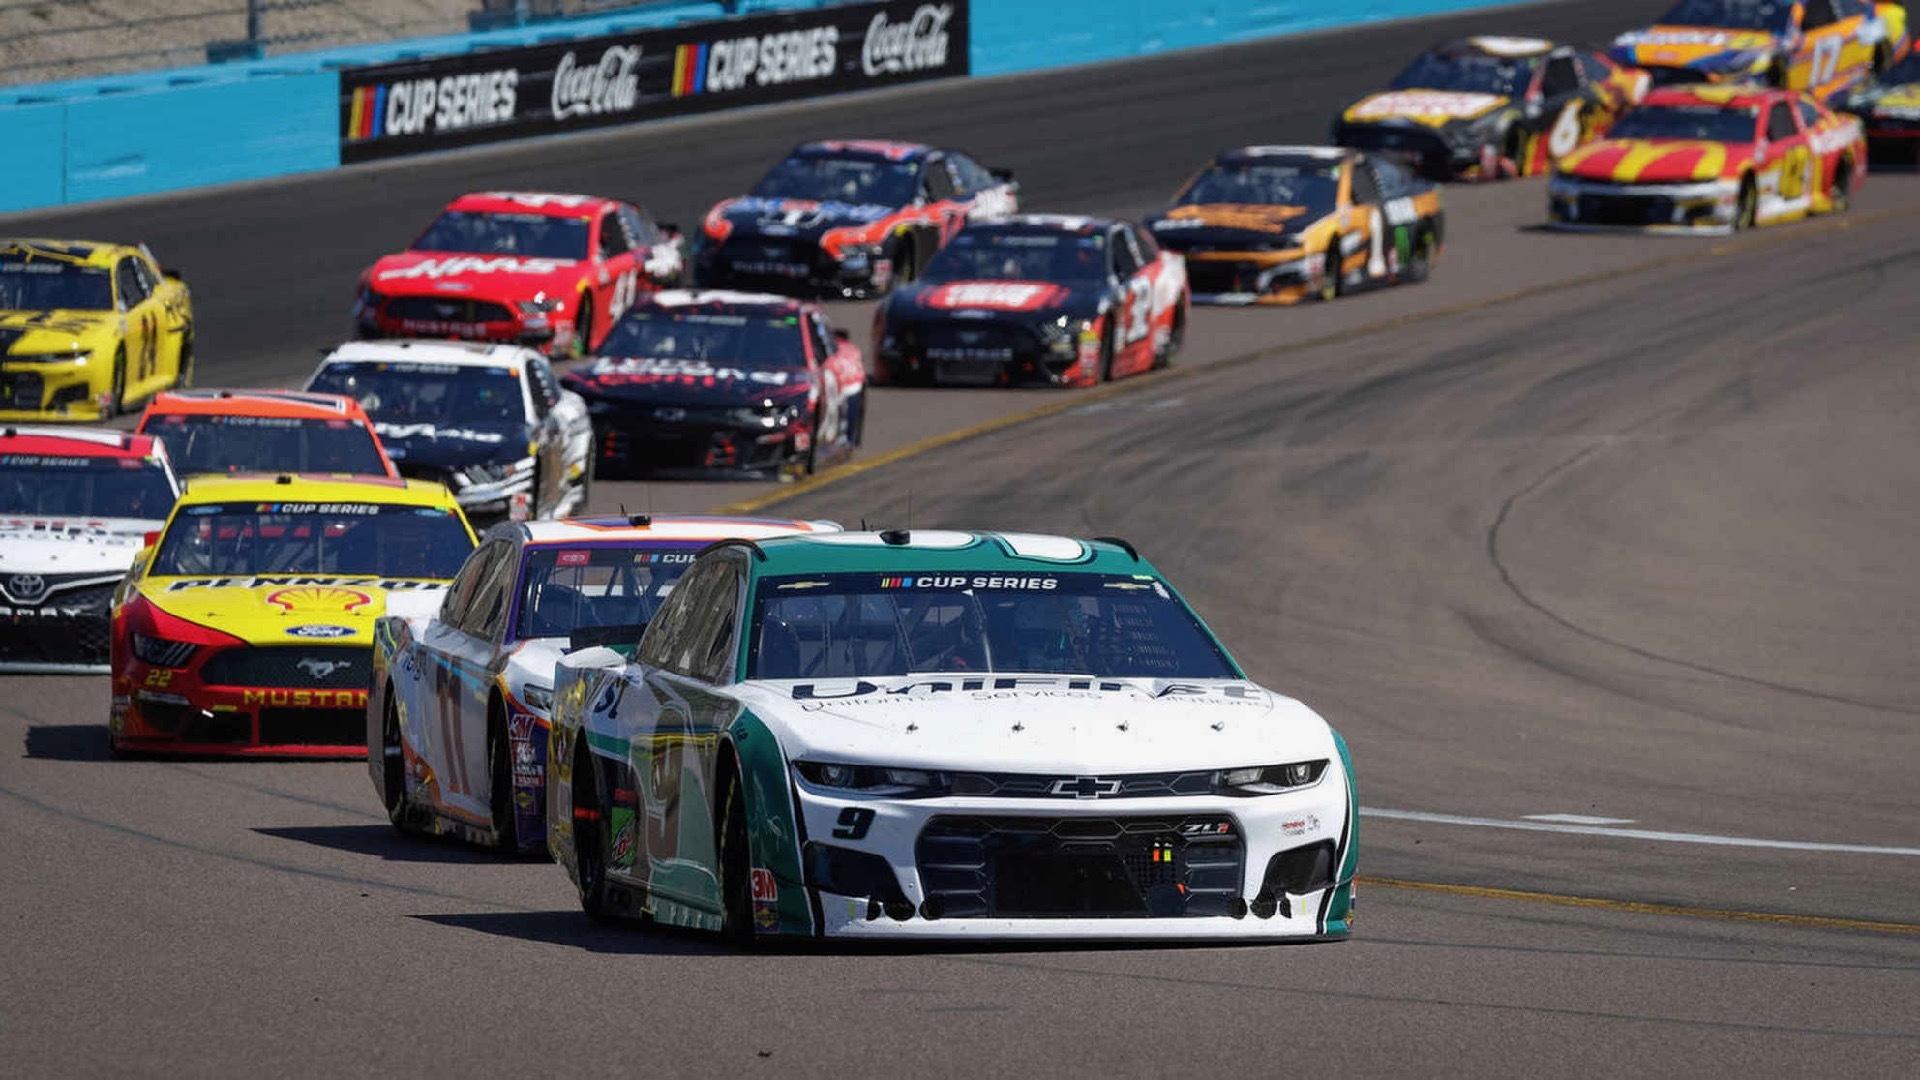 2020 NASCAR Cup Series